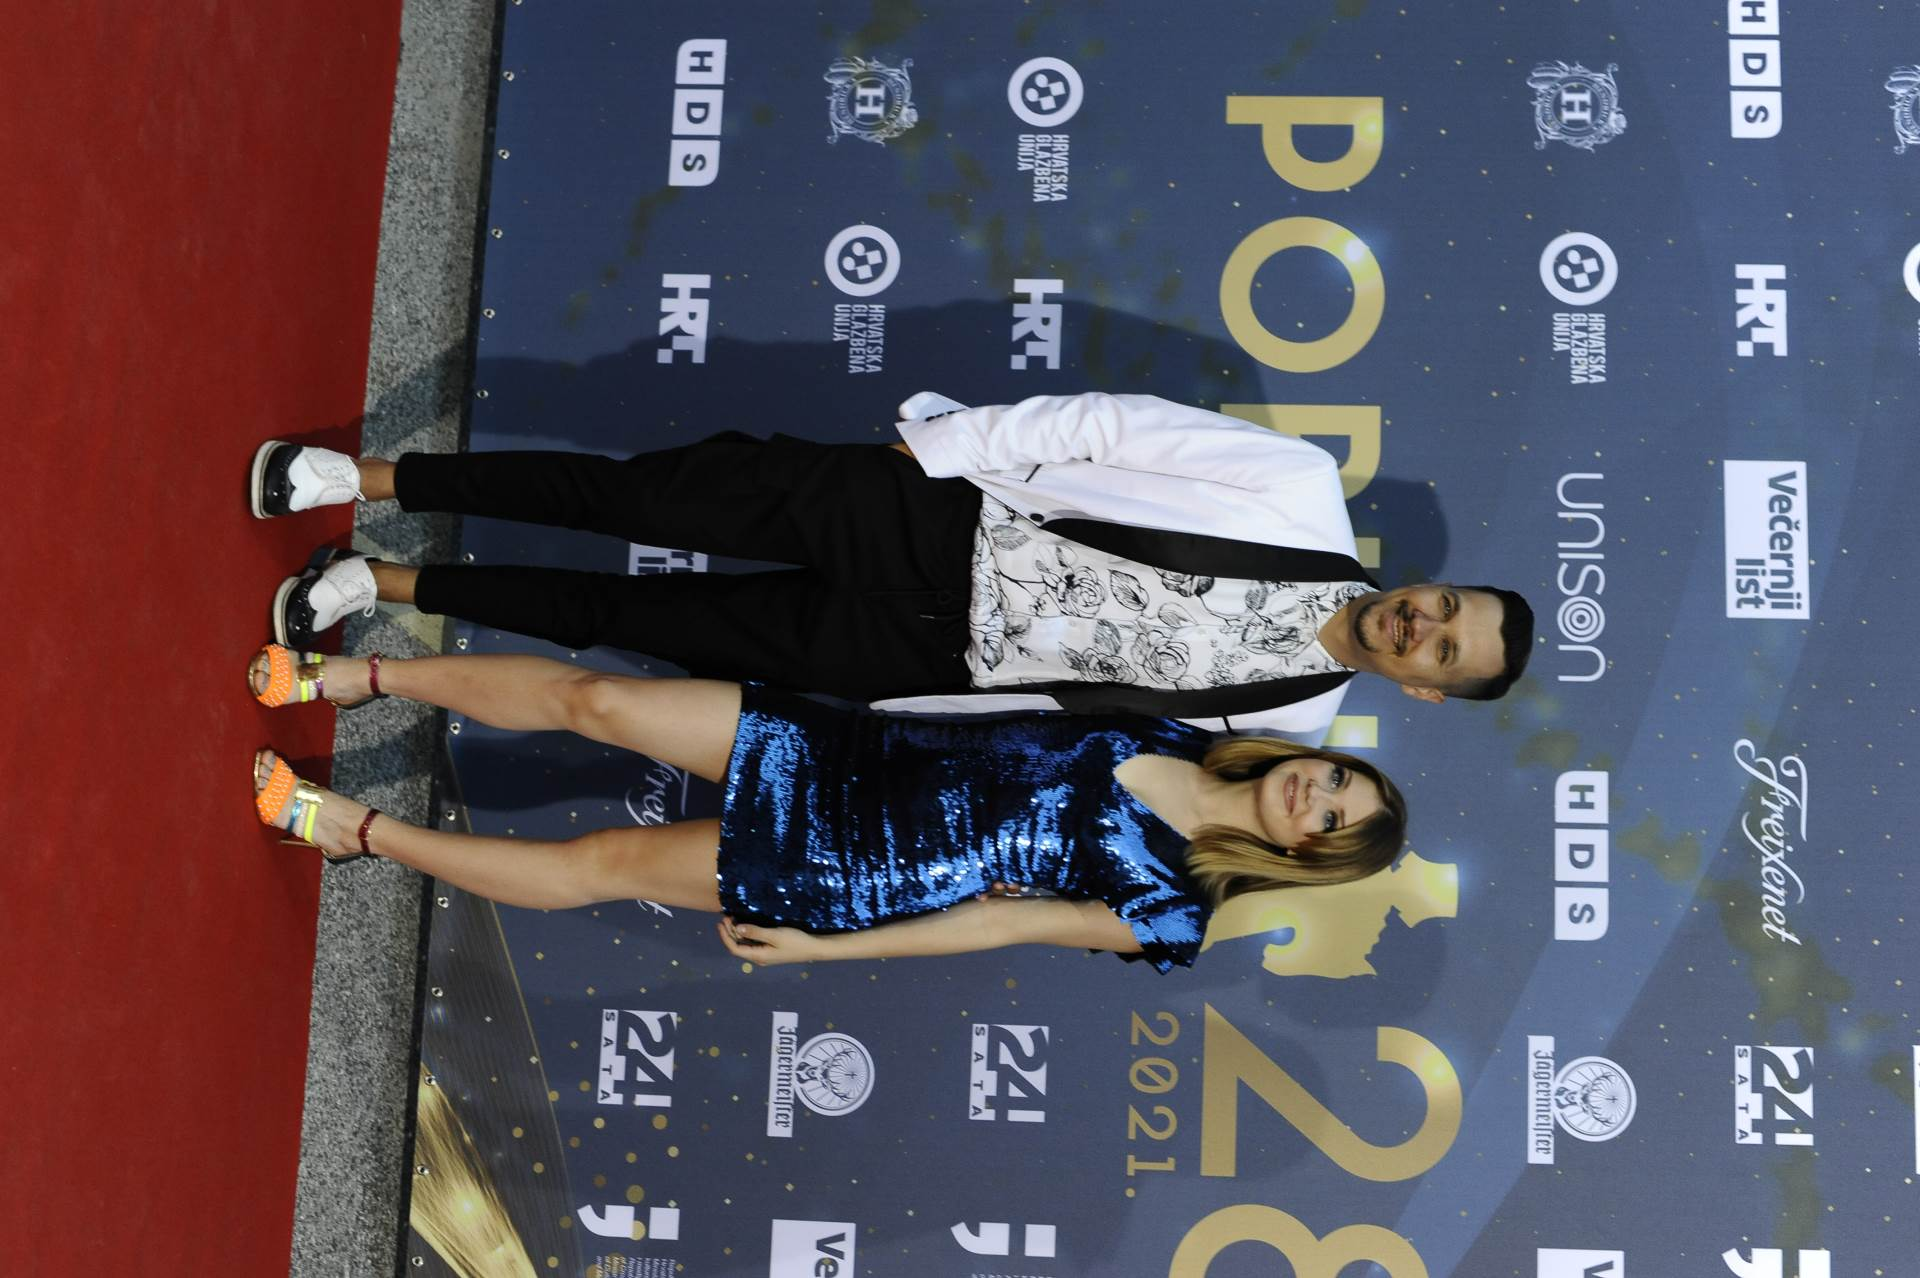 Marko Tolja i Mia Negovetić